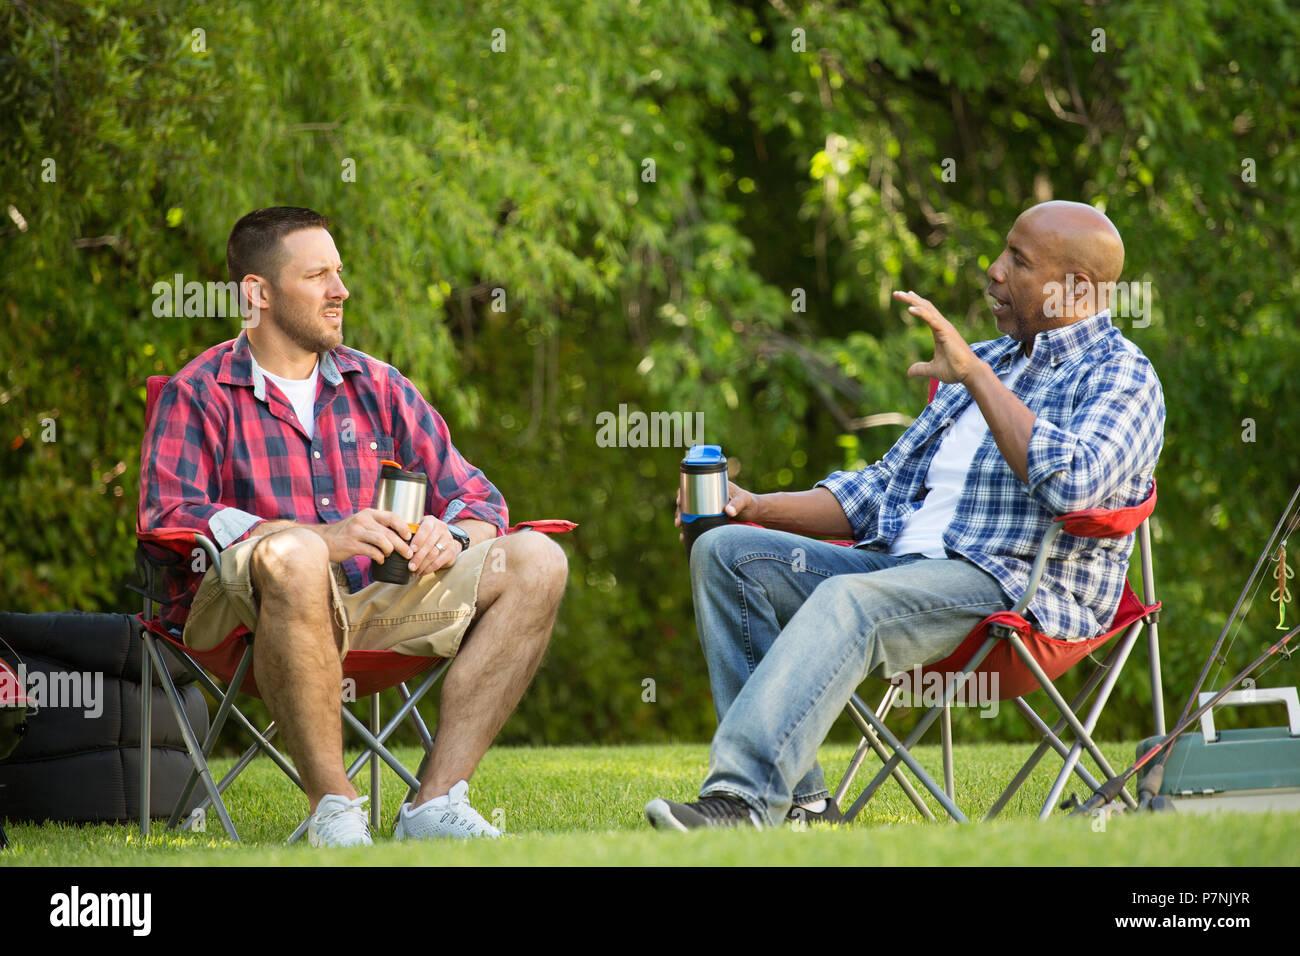 Amis parler et le camping. Photo Stock